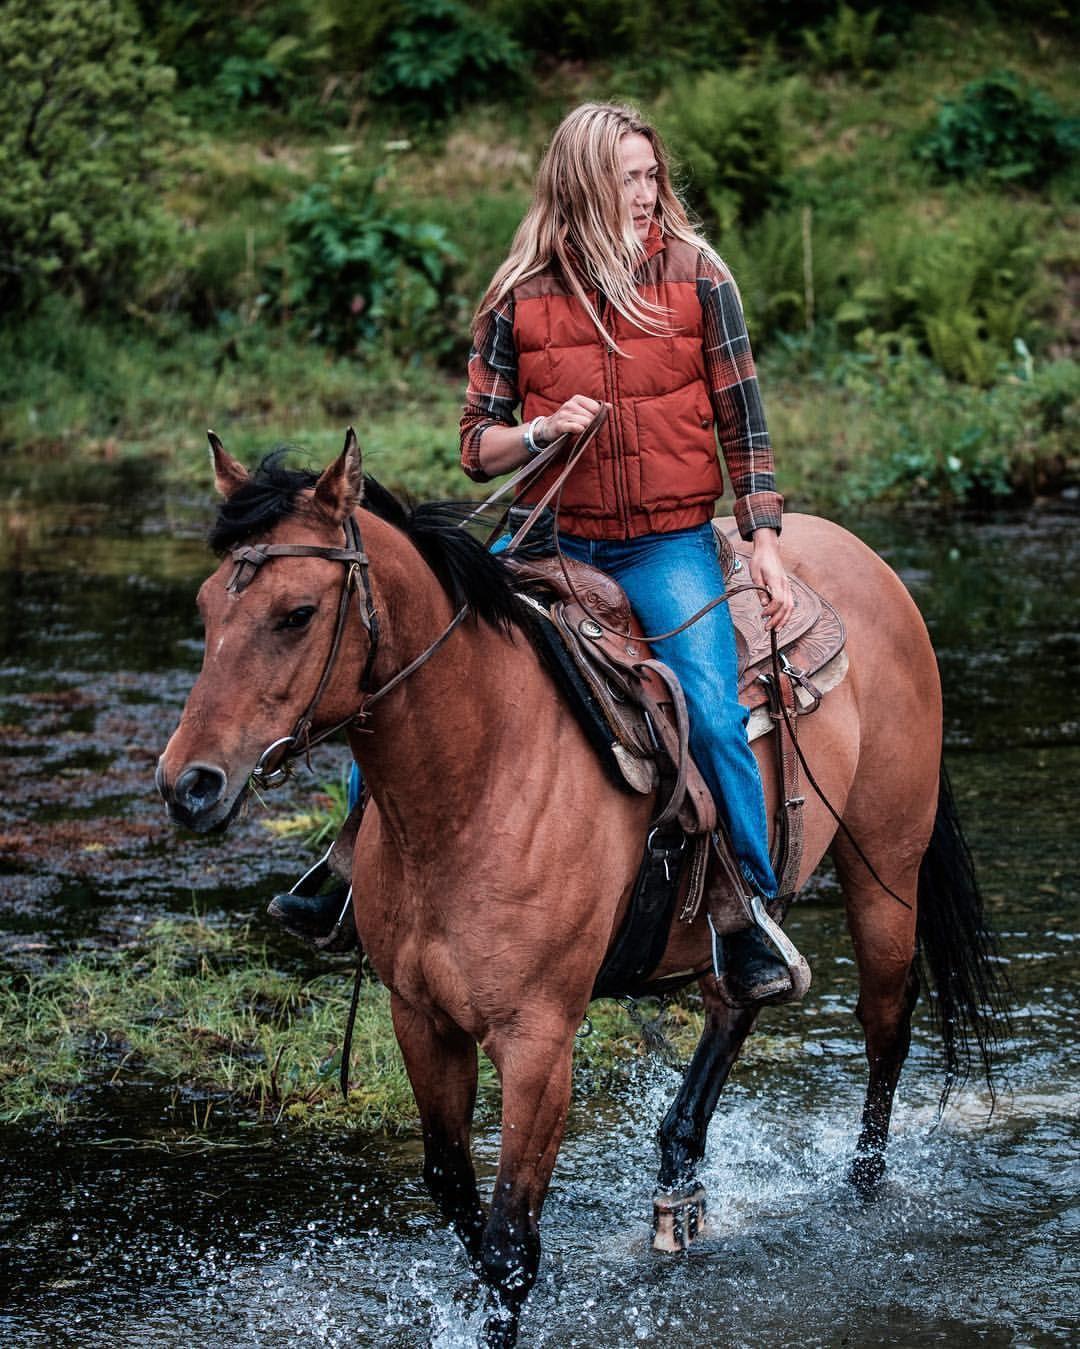 Pin by Christina Mathias on Horses | Horses, Western horse ...